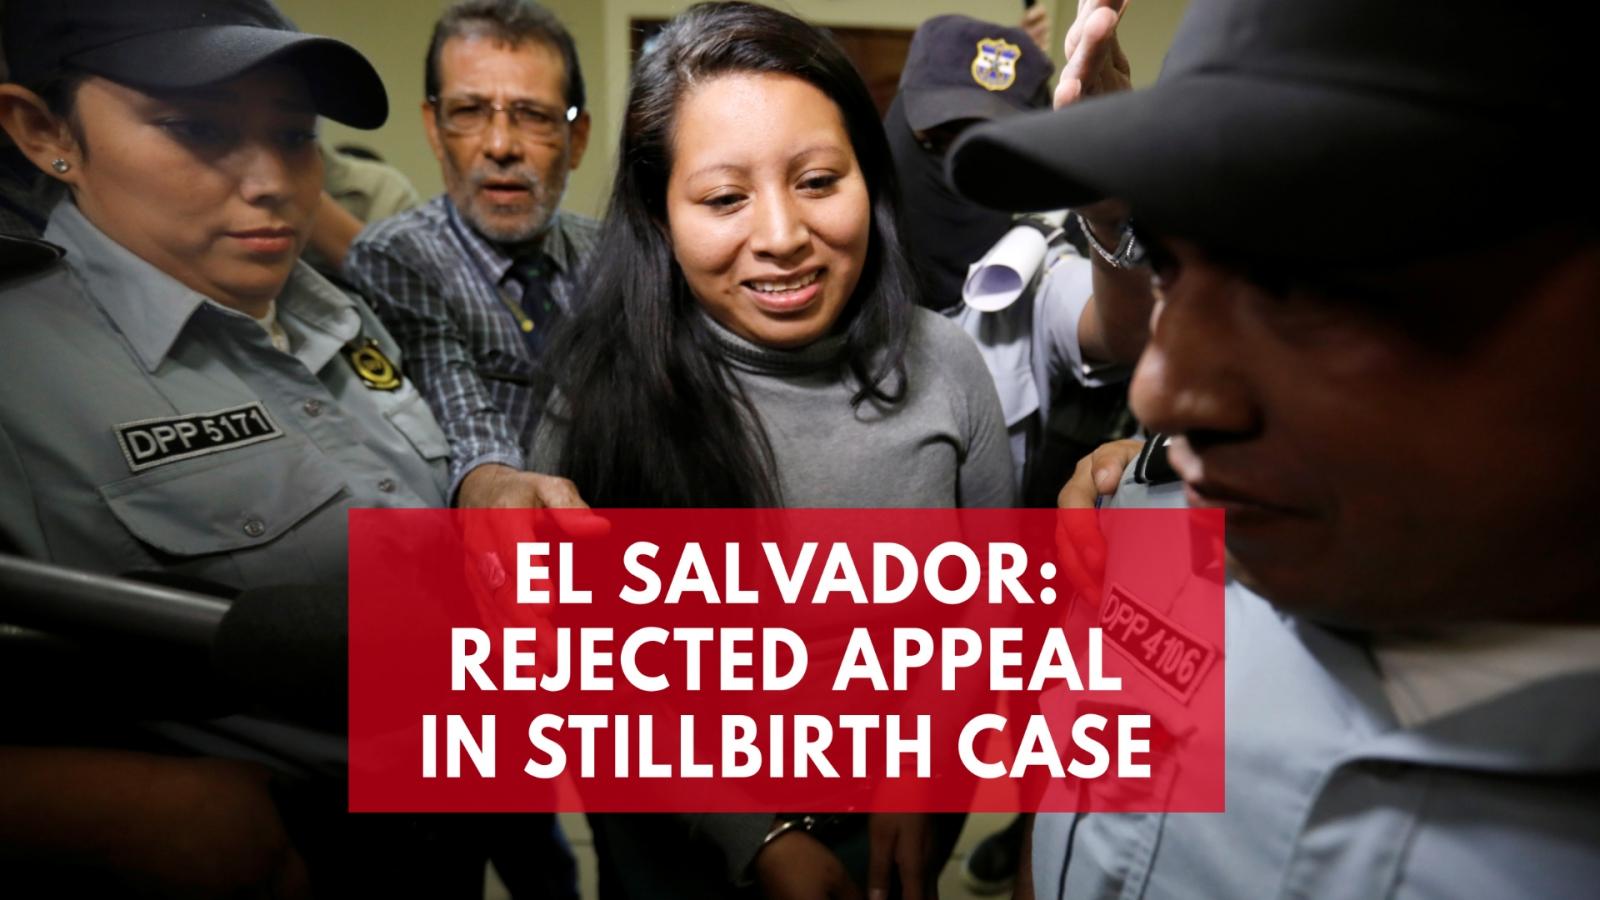 El Salvador court upholds woman's 30-year sentence in stillbirth case